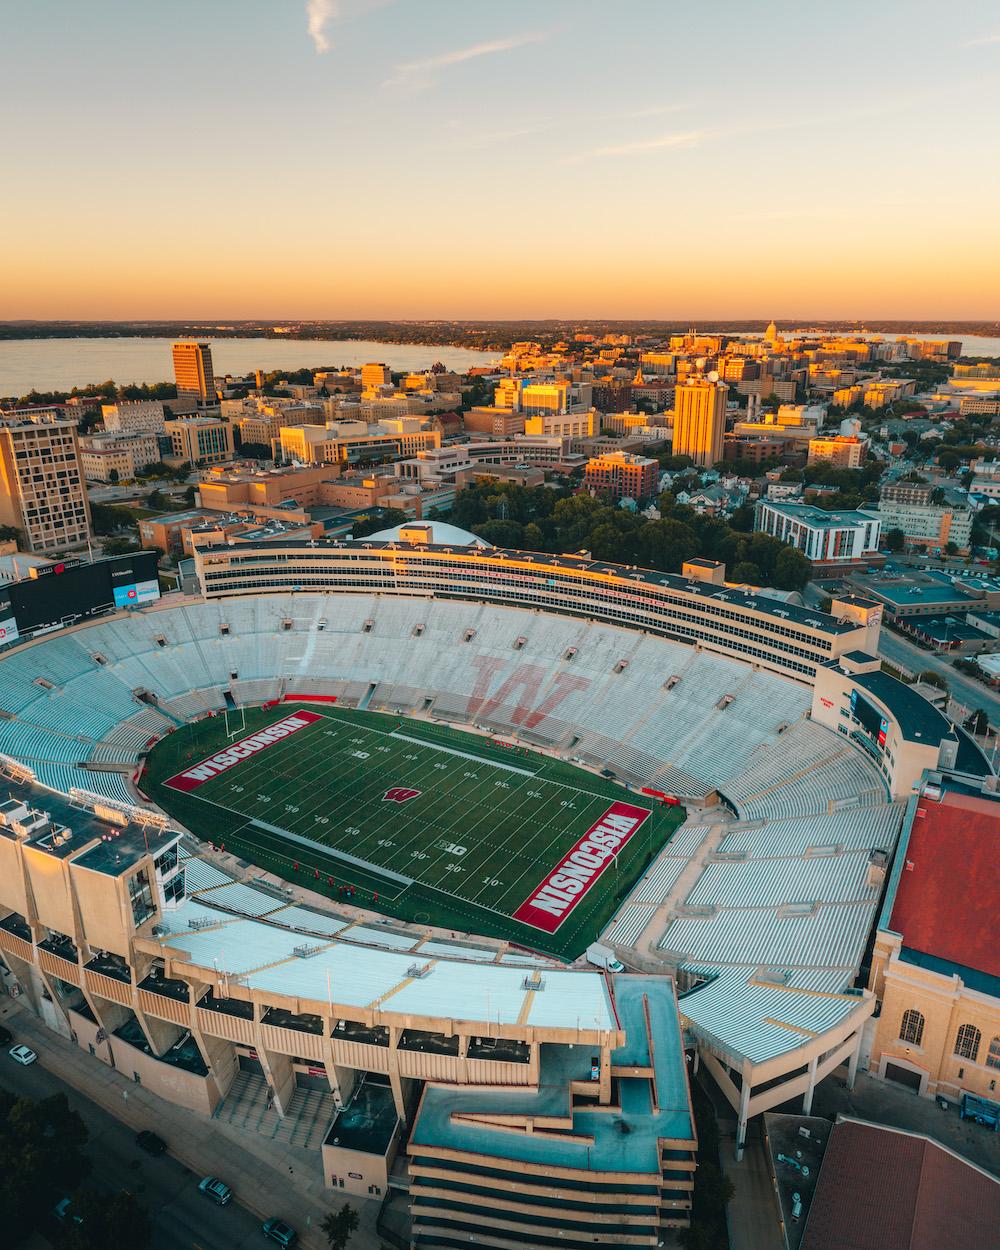 Aerial photo of Camp Randall Stadium and the UW-Madison campus